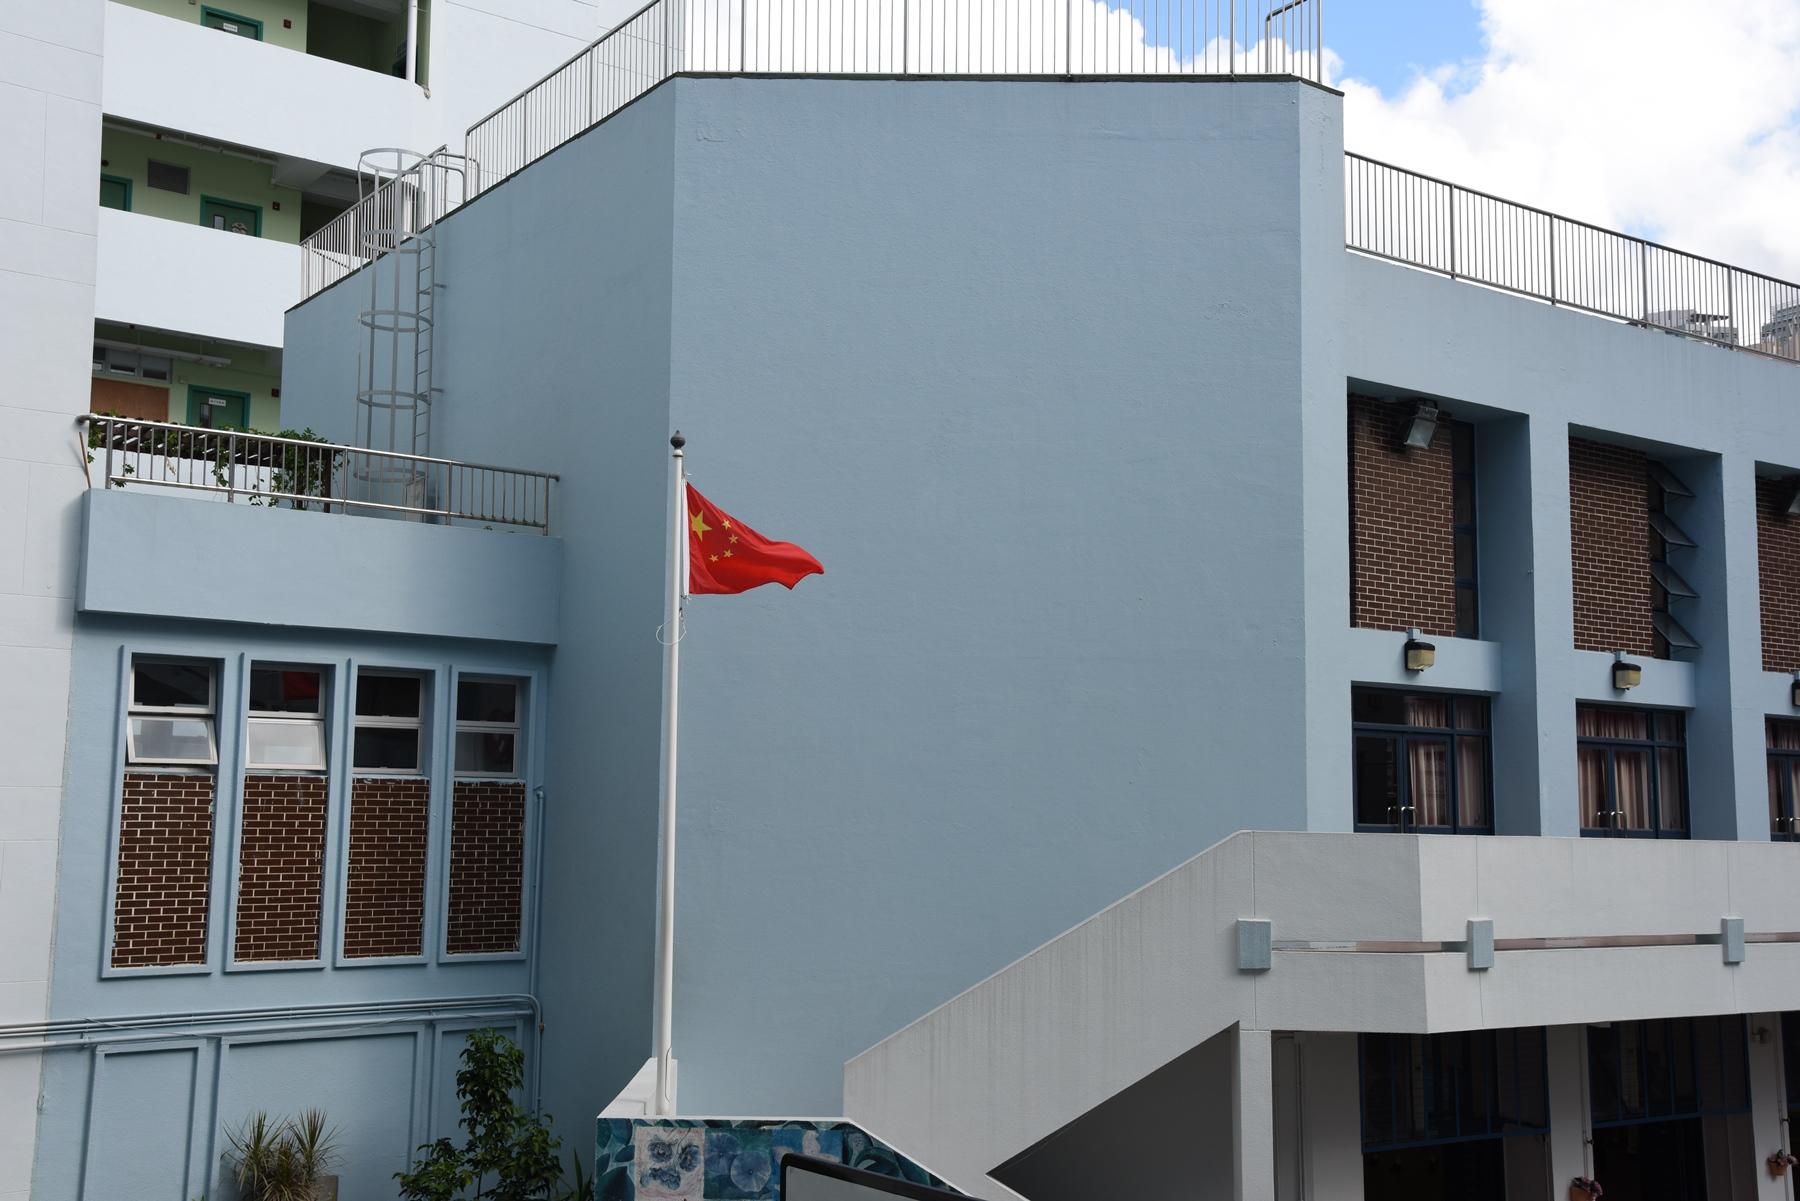 http://www.npc.edu.hk/sites/default/files/dsc_1350.jpg